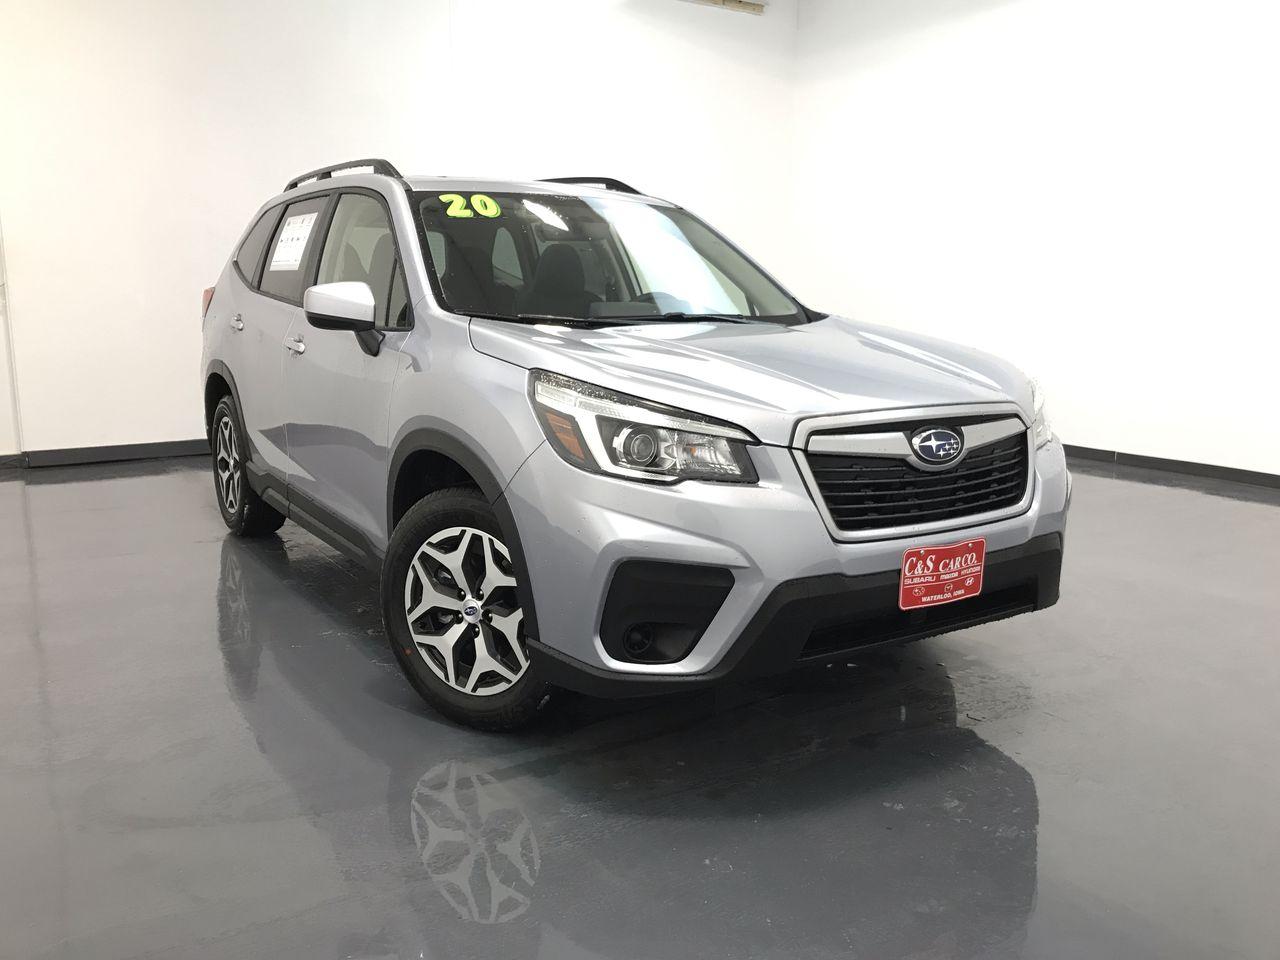 2020 Subaru Forester 2.5i Premium w/ Eyesight  - SB8500  - C & S Car Company